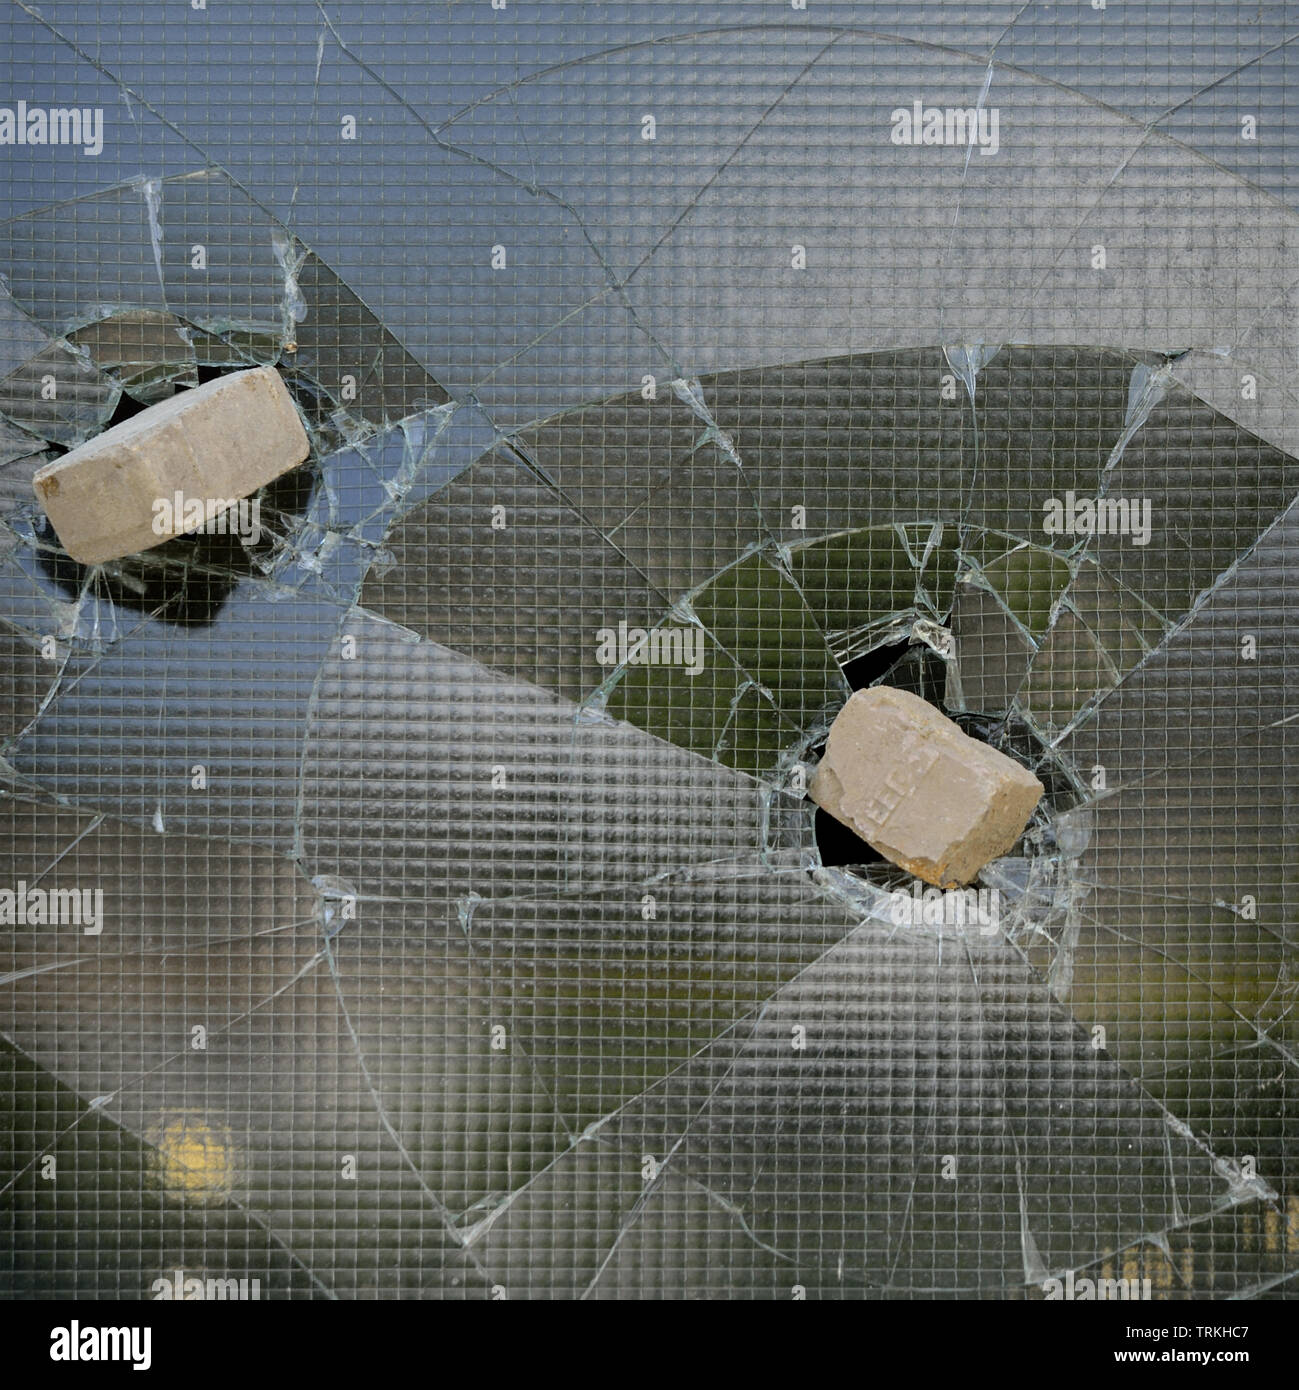 Briks trapped Broken Window - Stock Image